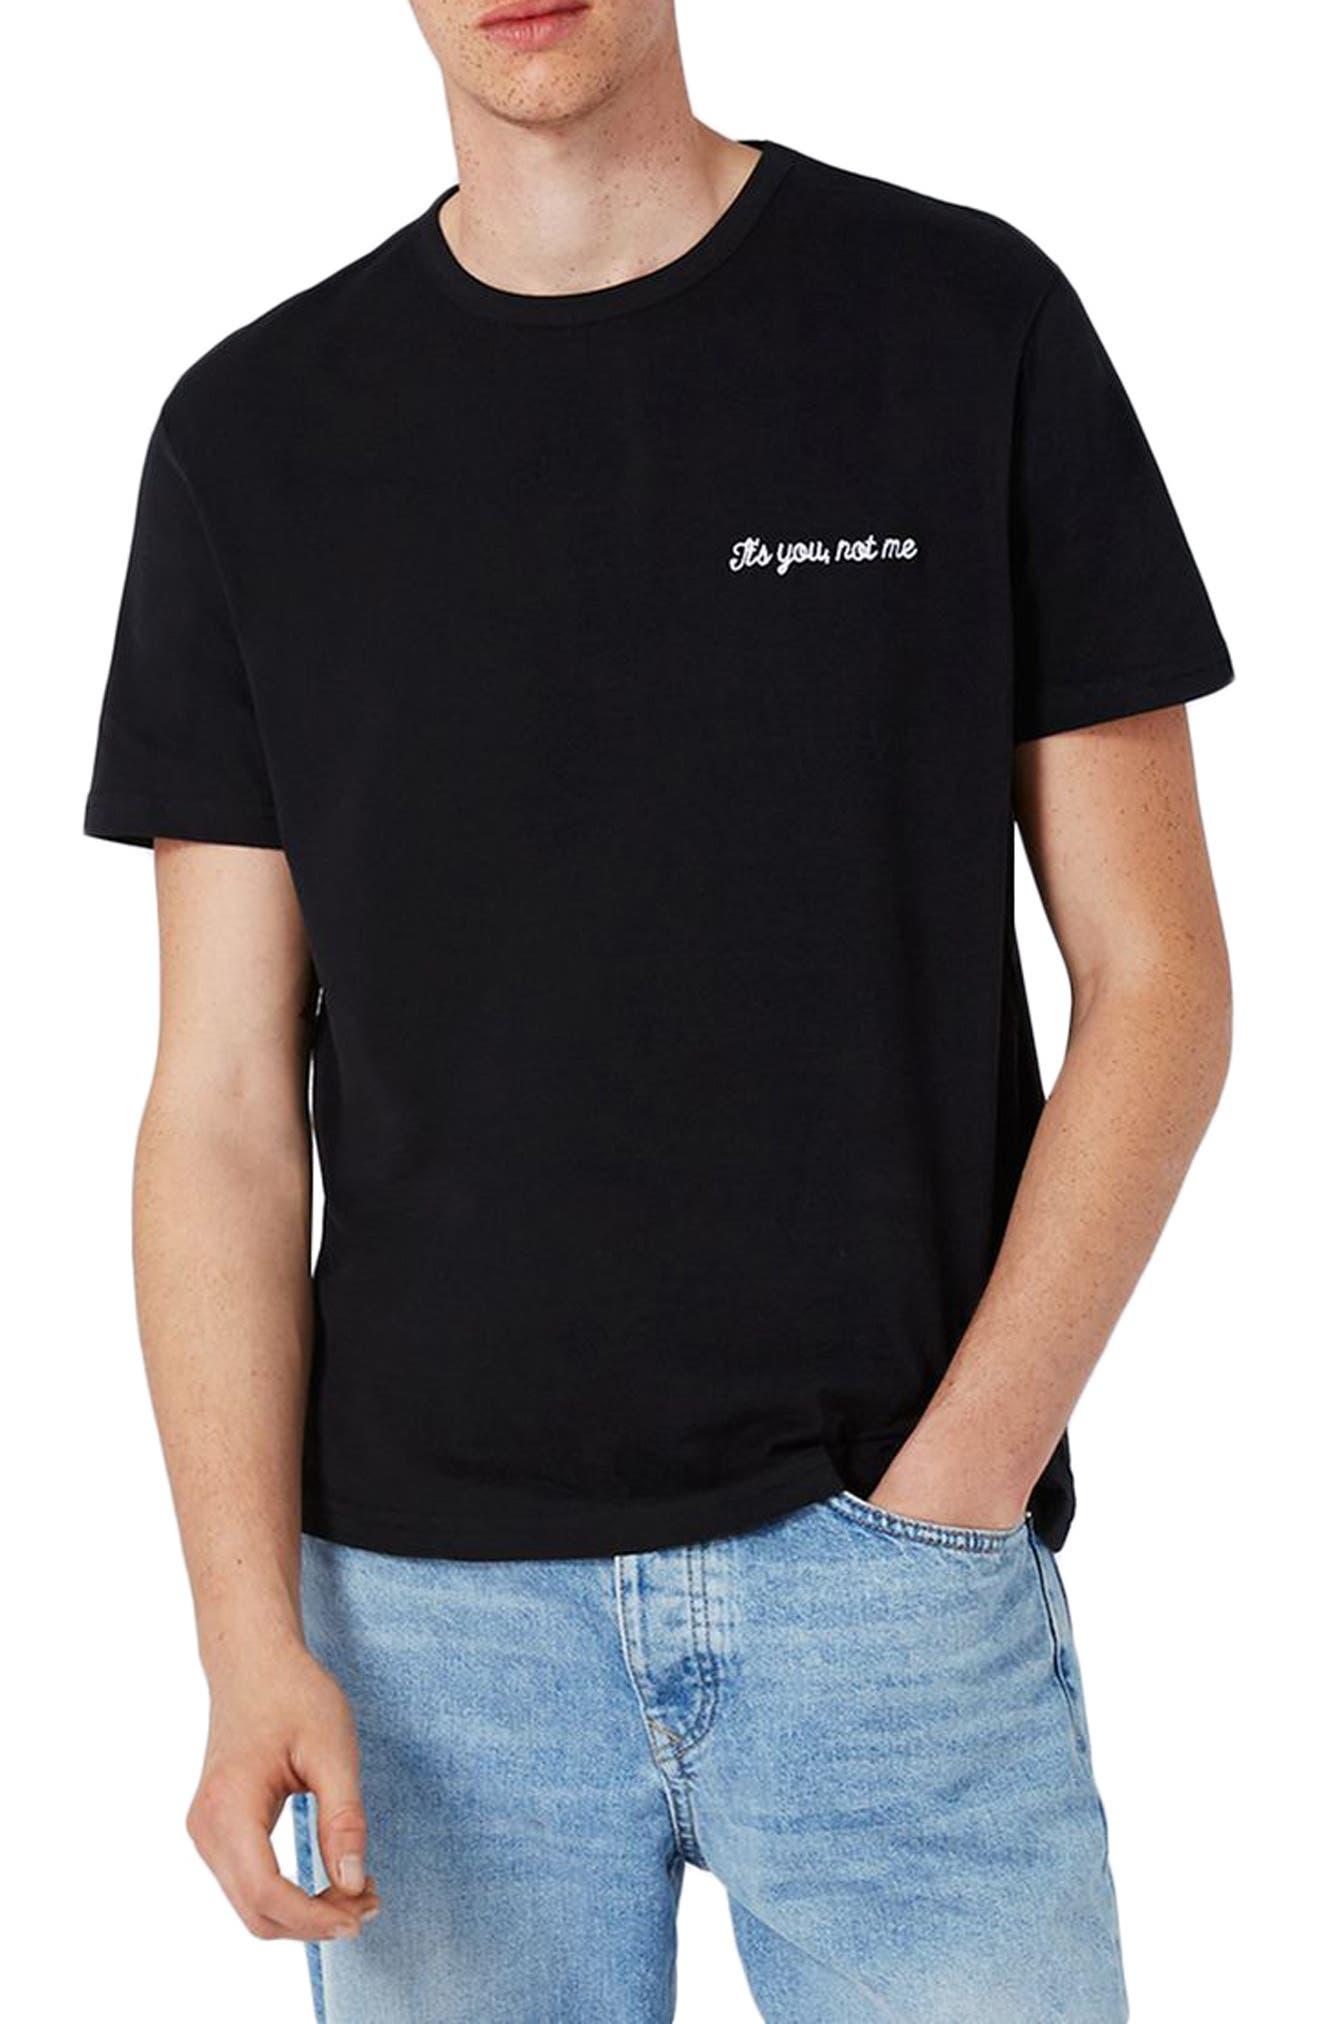 Not Me Embroidery T-Shirt,                             Main thumbnail 1, color,                             Black